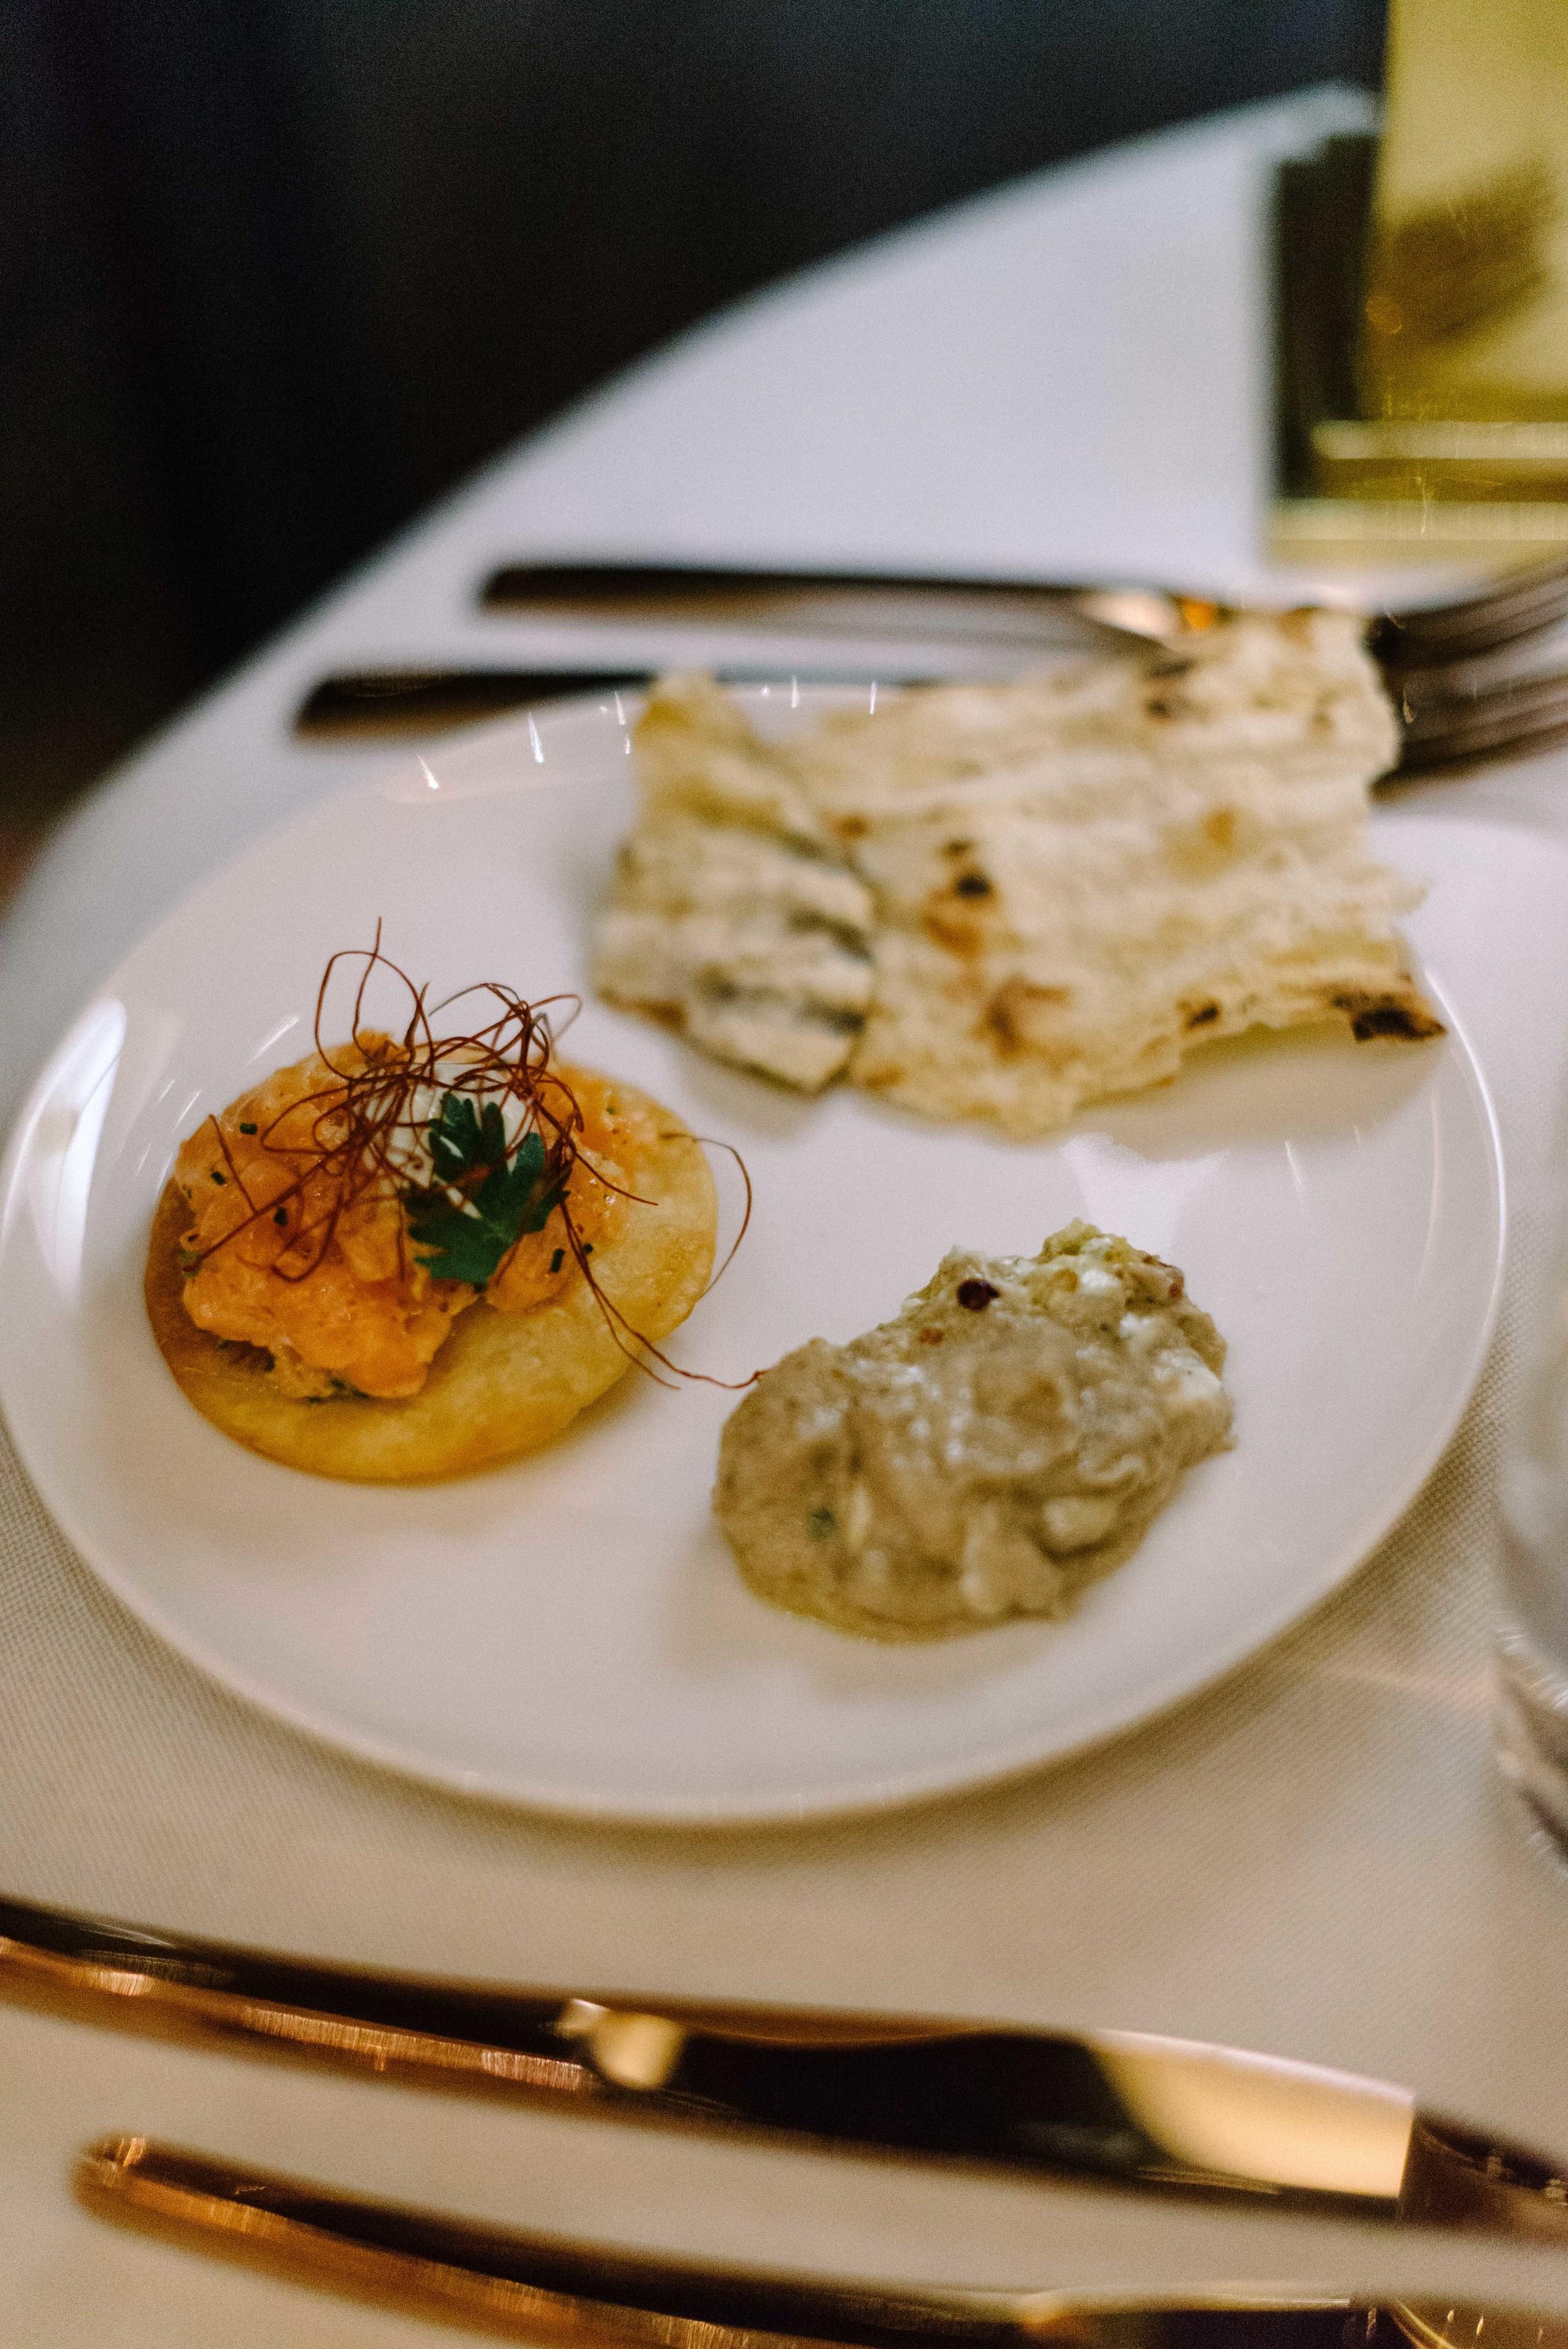 Tuna tostada, smoked eggplant and grilled flatbread